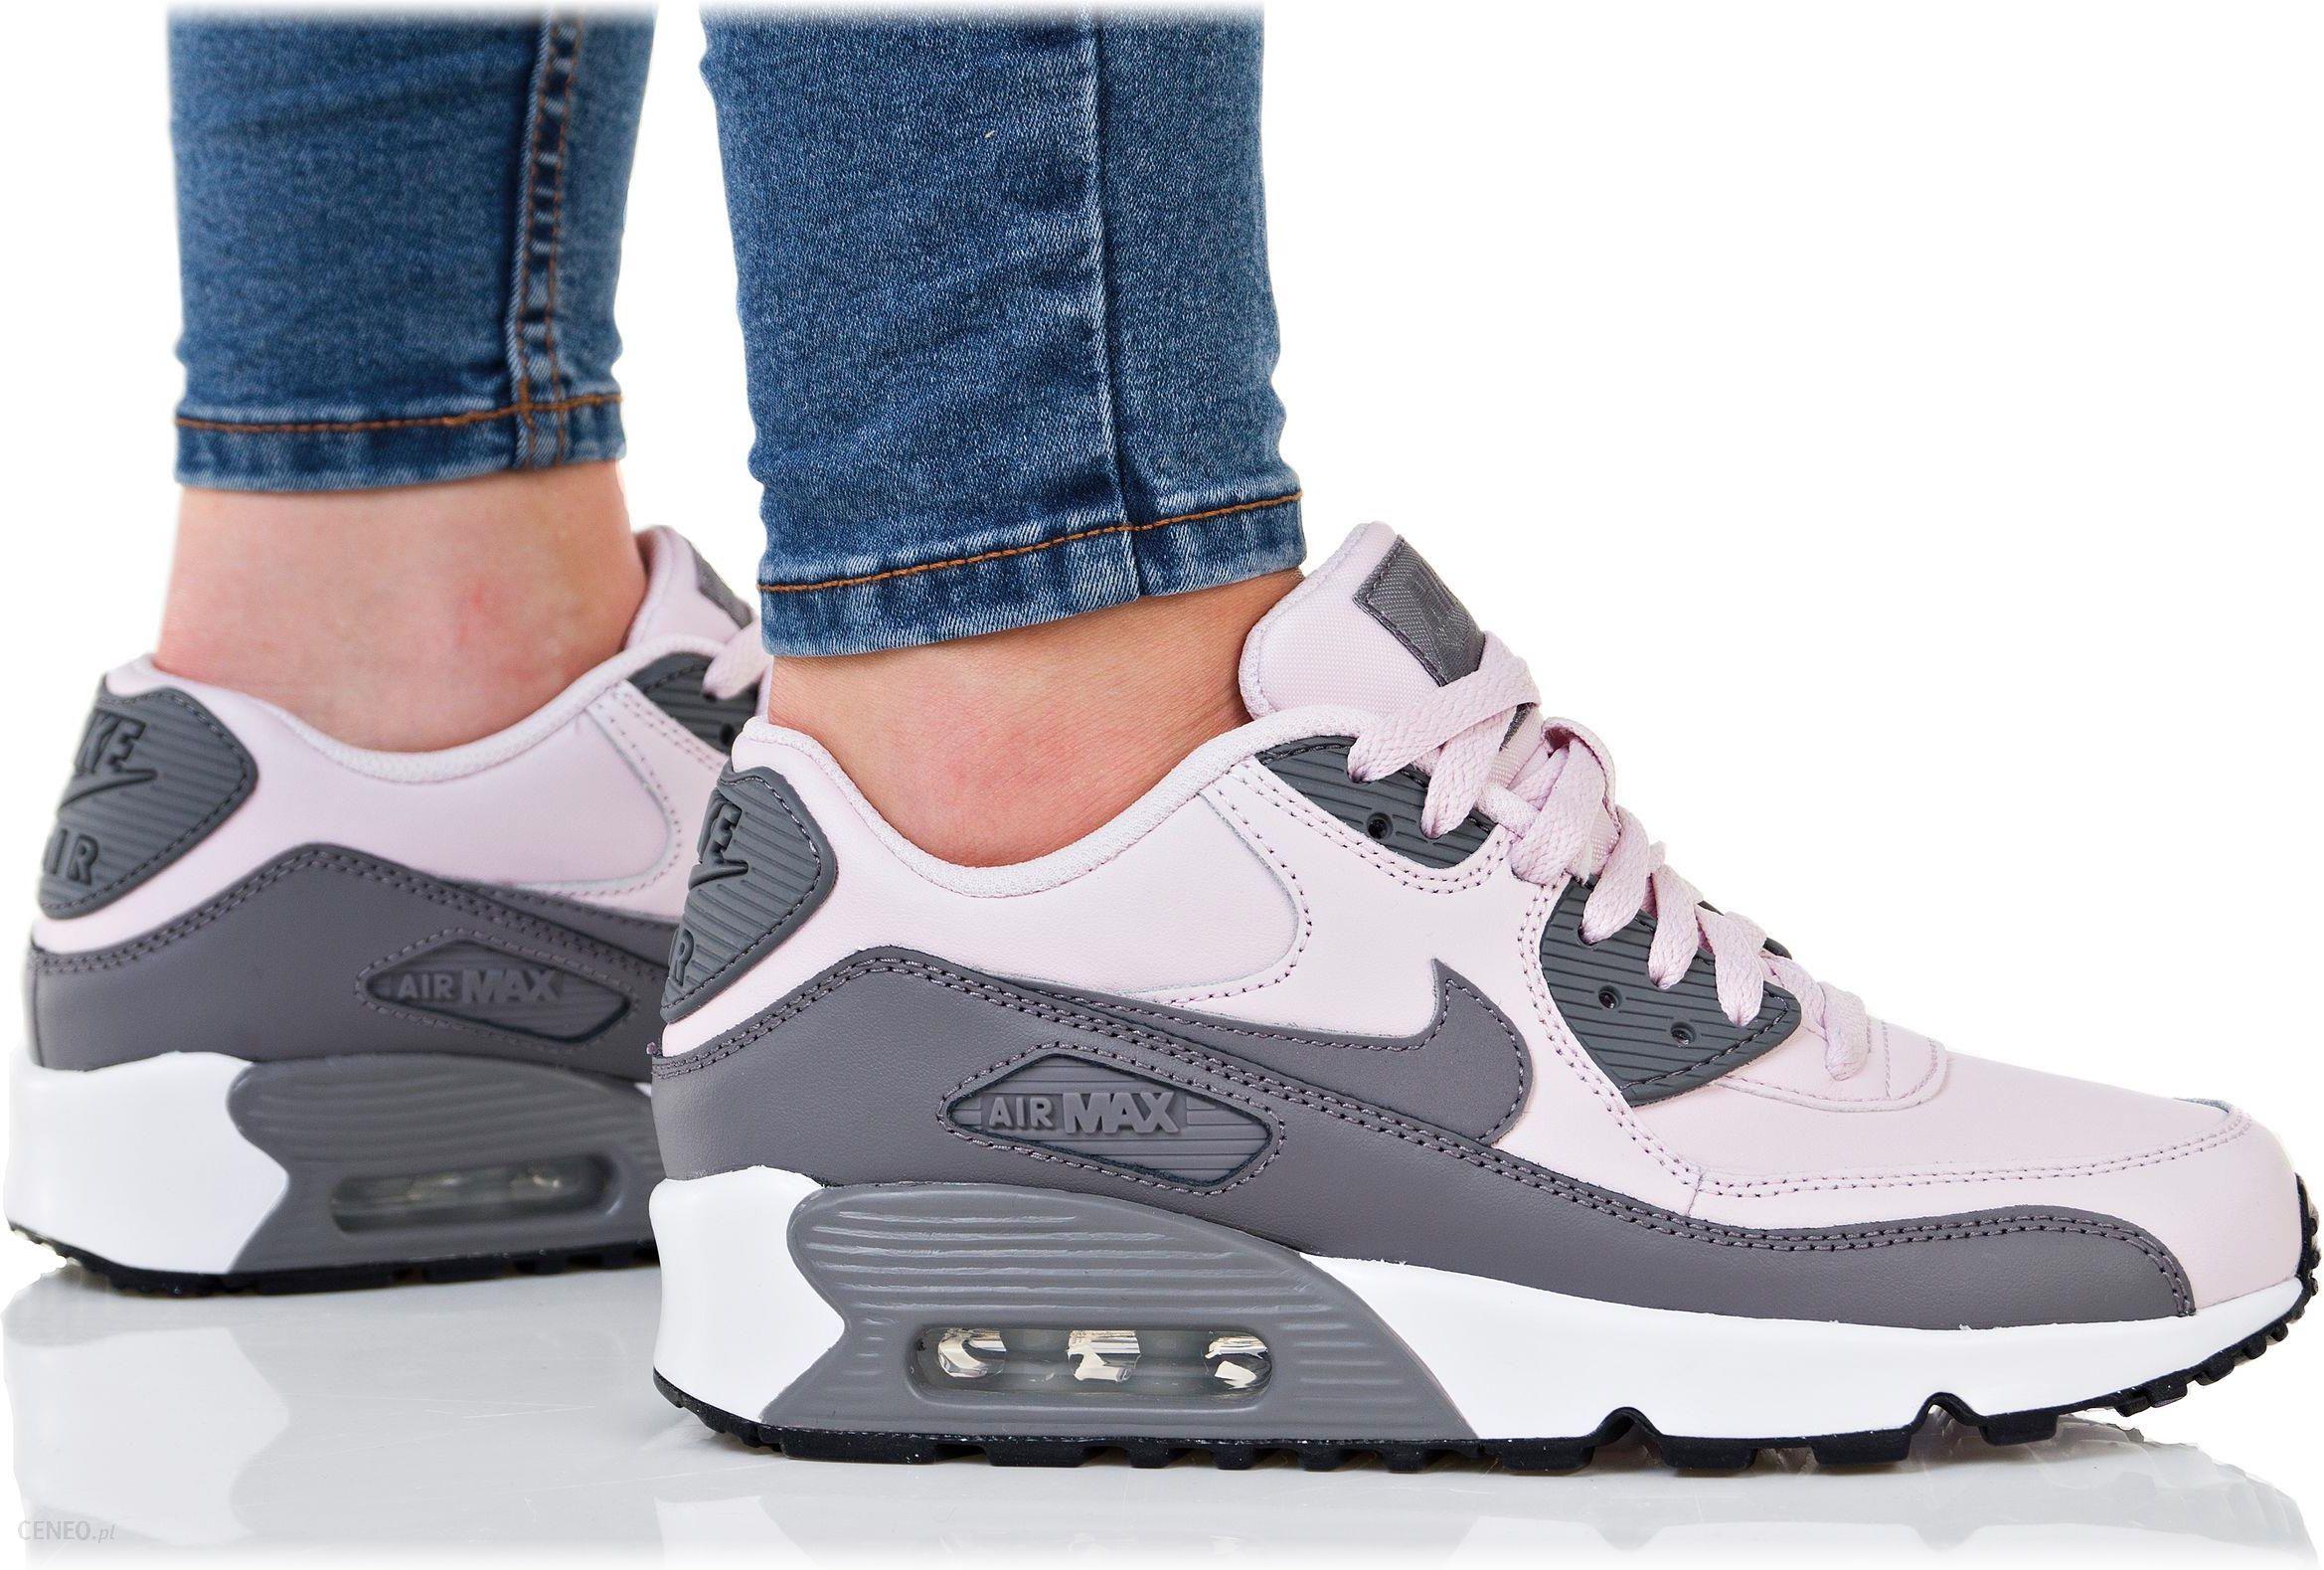 10c9d74b8 Buty Nike Damskie Air Max 90 Ltr Gs 833376-601 - Ceny i opinie ...